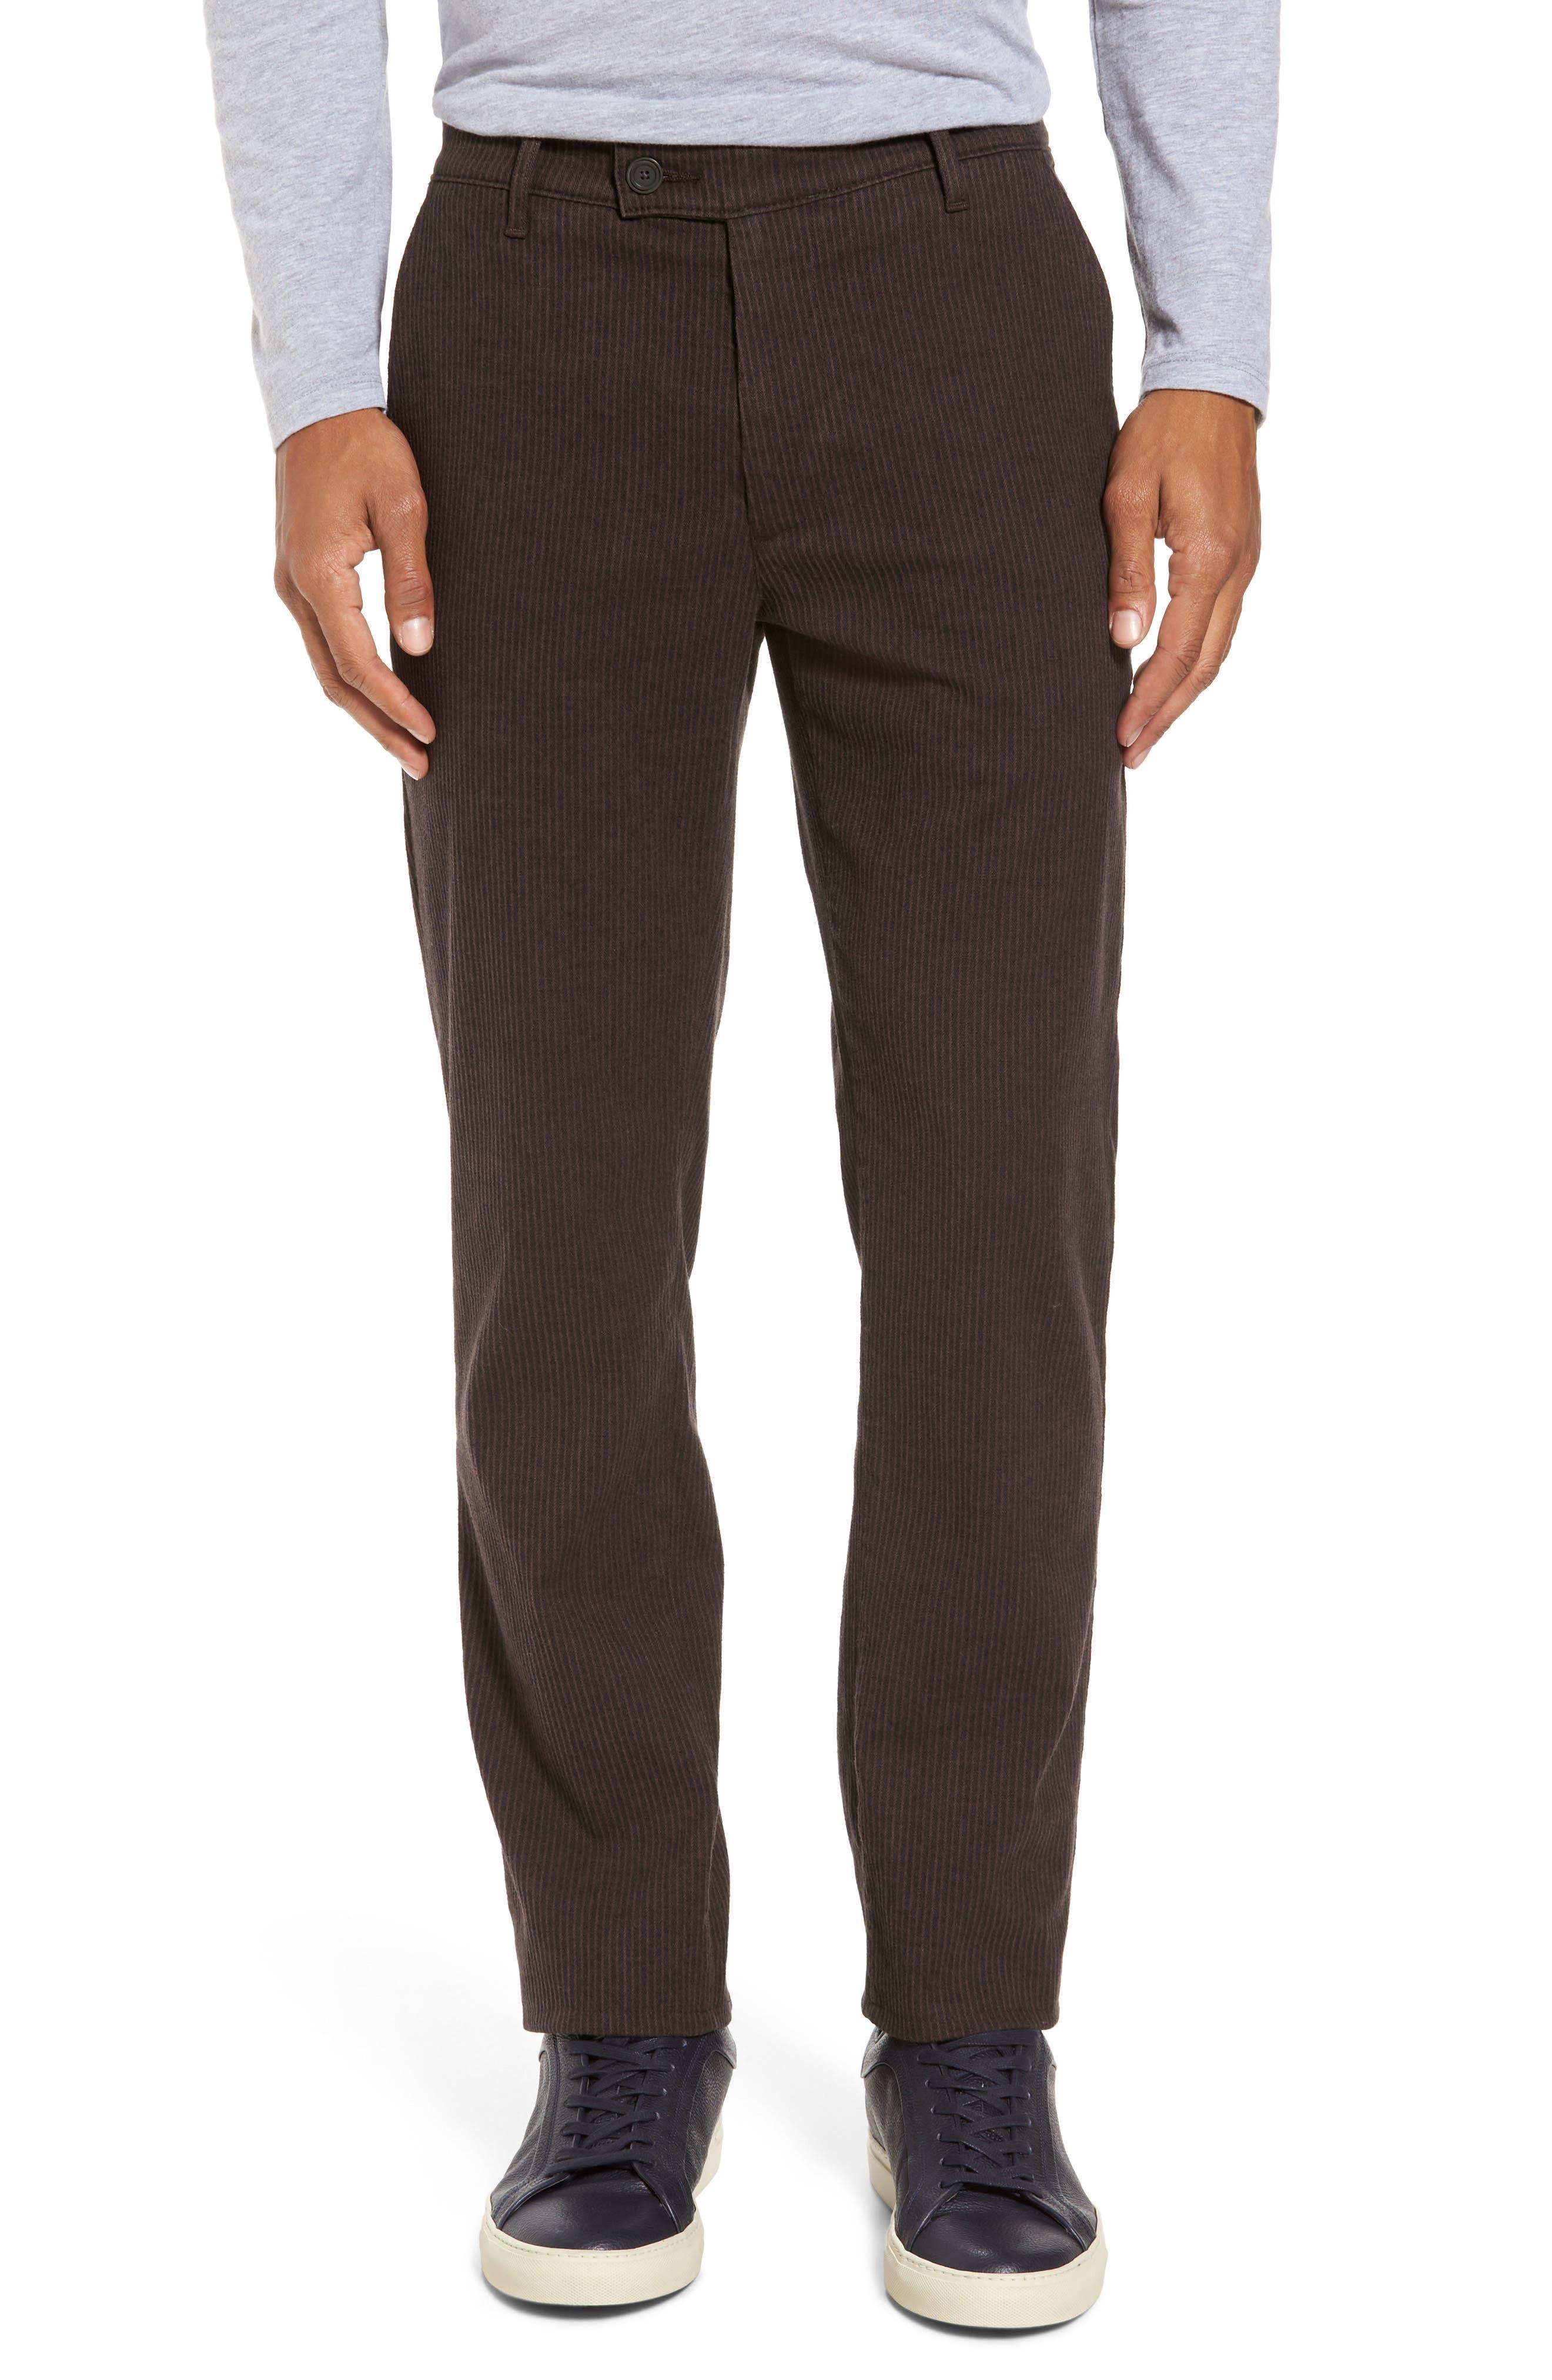 Marshall Slim Fit Pinstripe Pants,                             Main thumbnail 1, color,                             Dark Oakwood